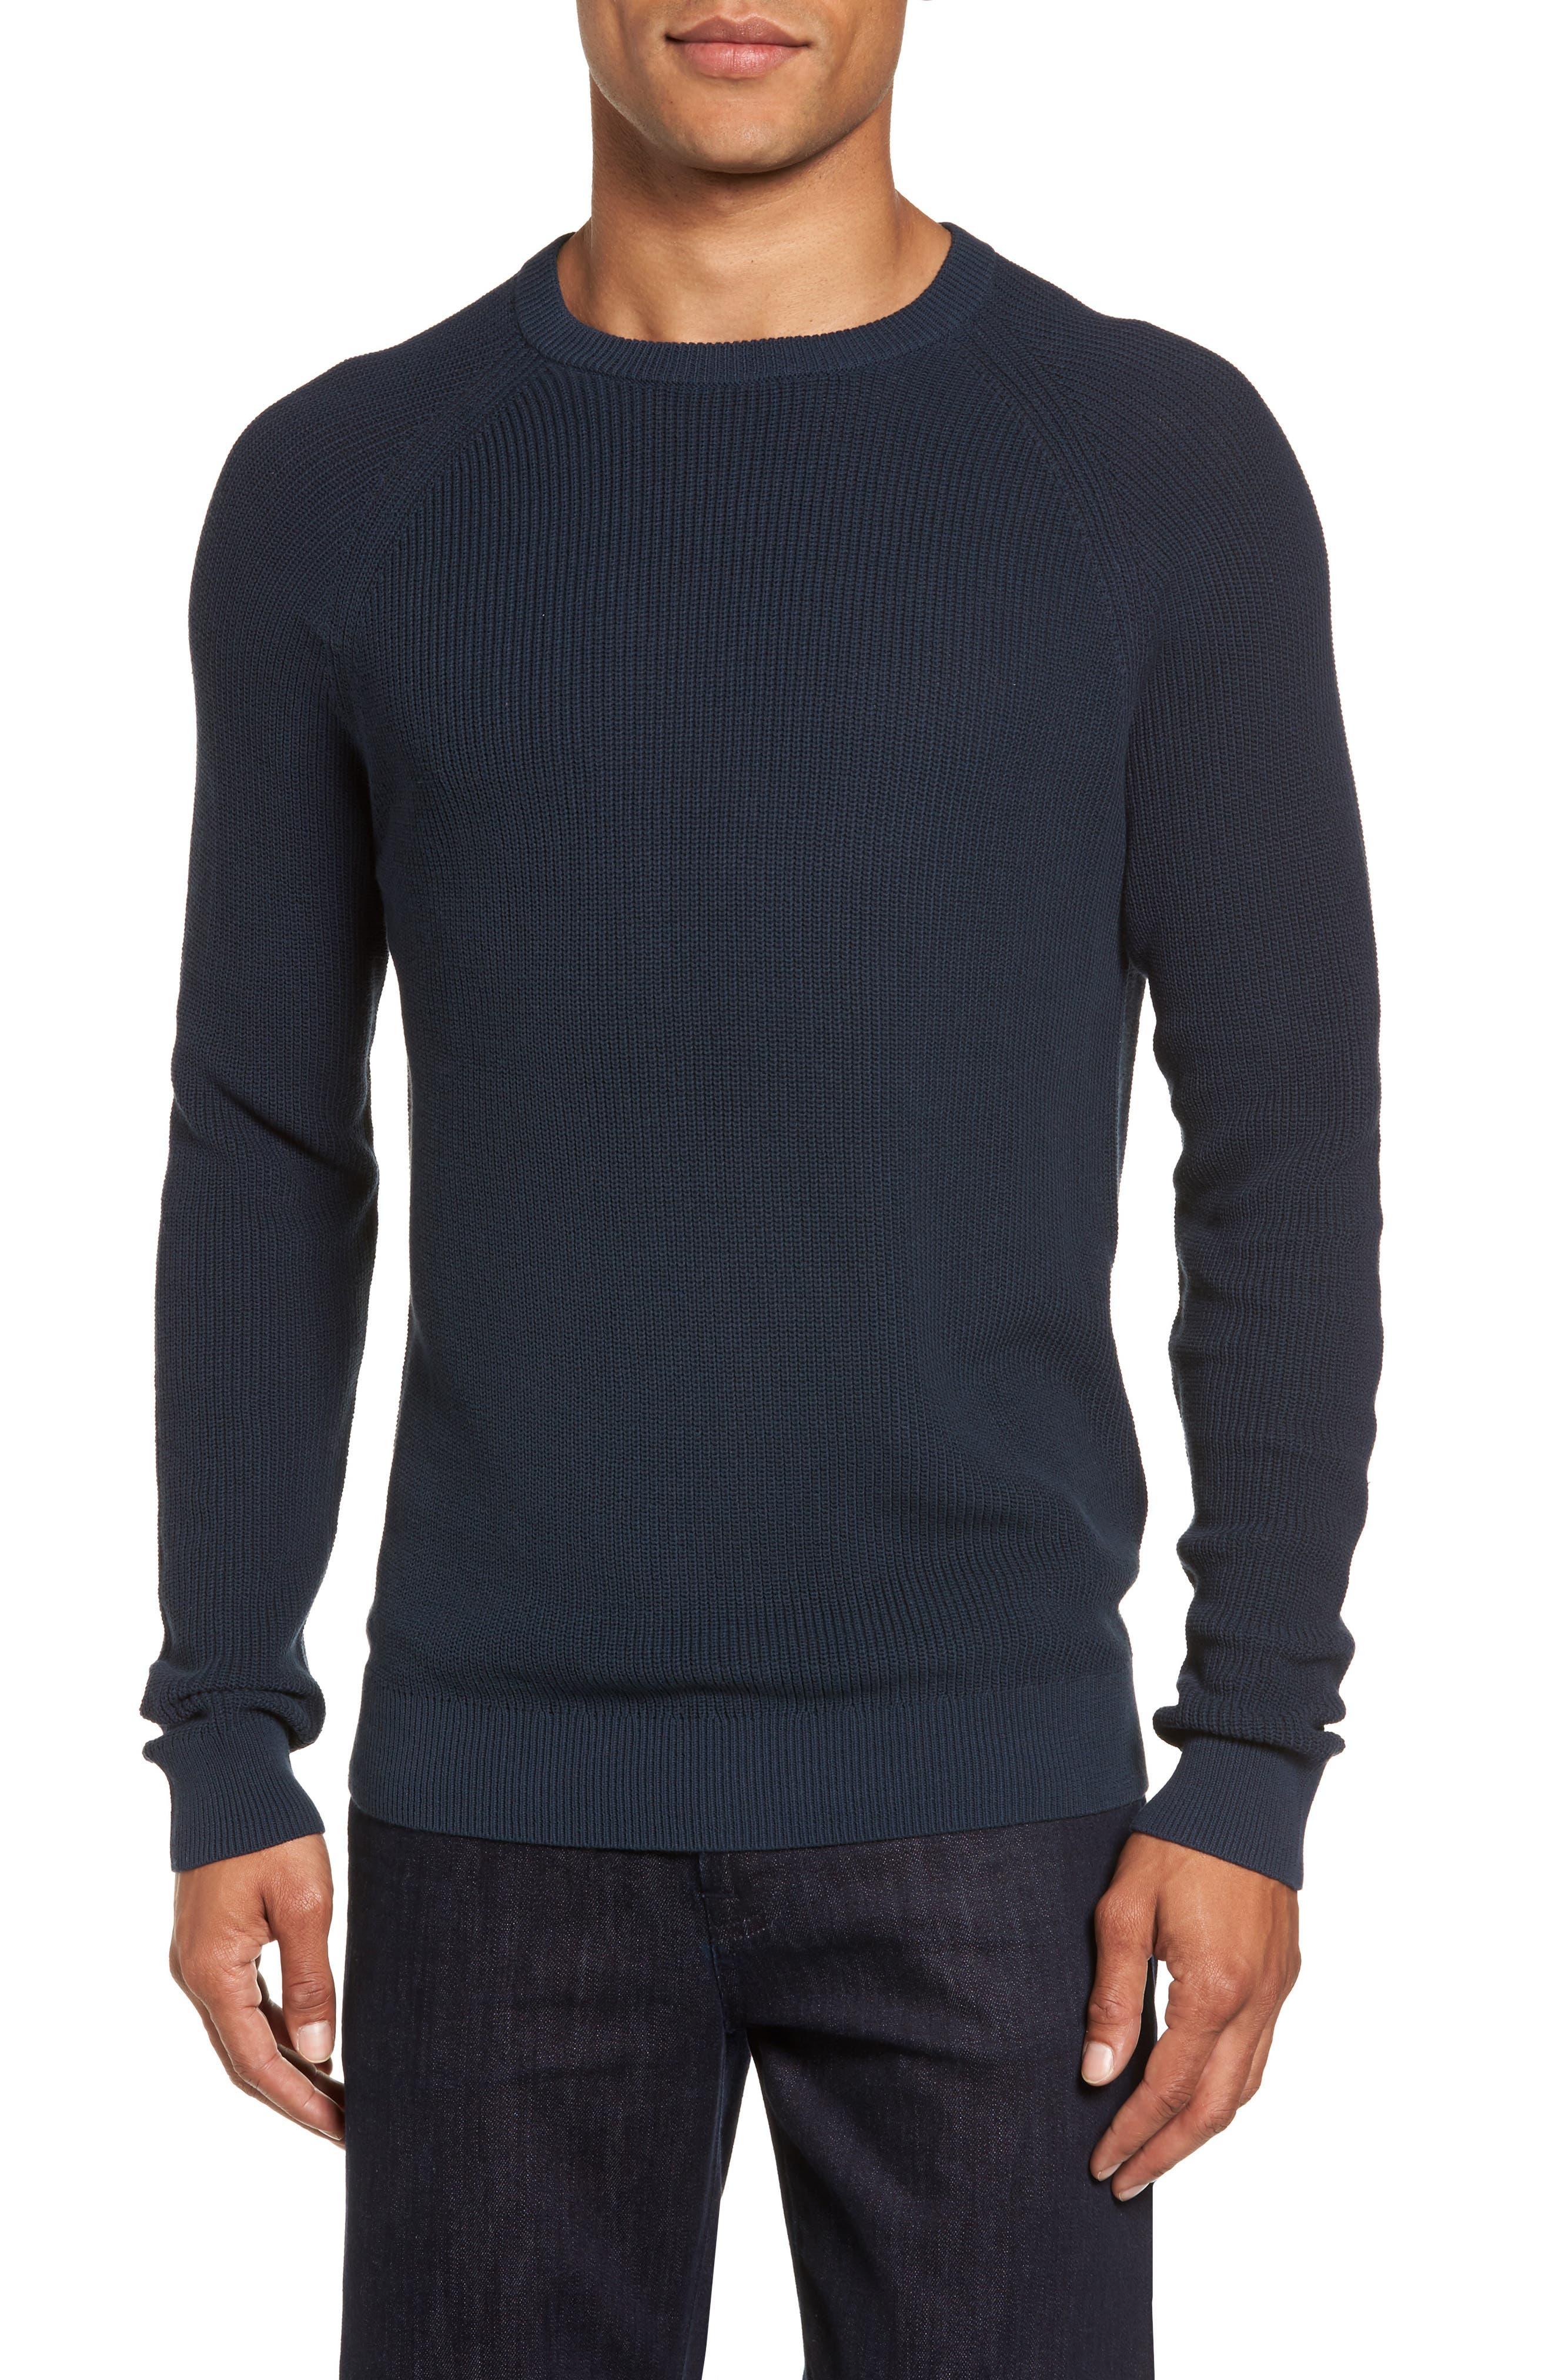 Nordstrom Men's Shop Crewneck Sweater (Regular)